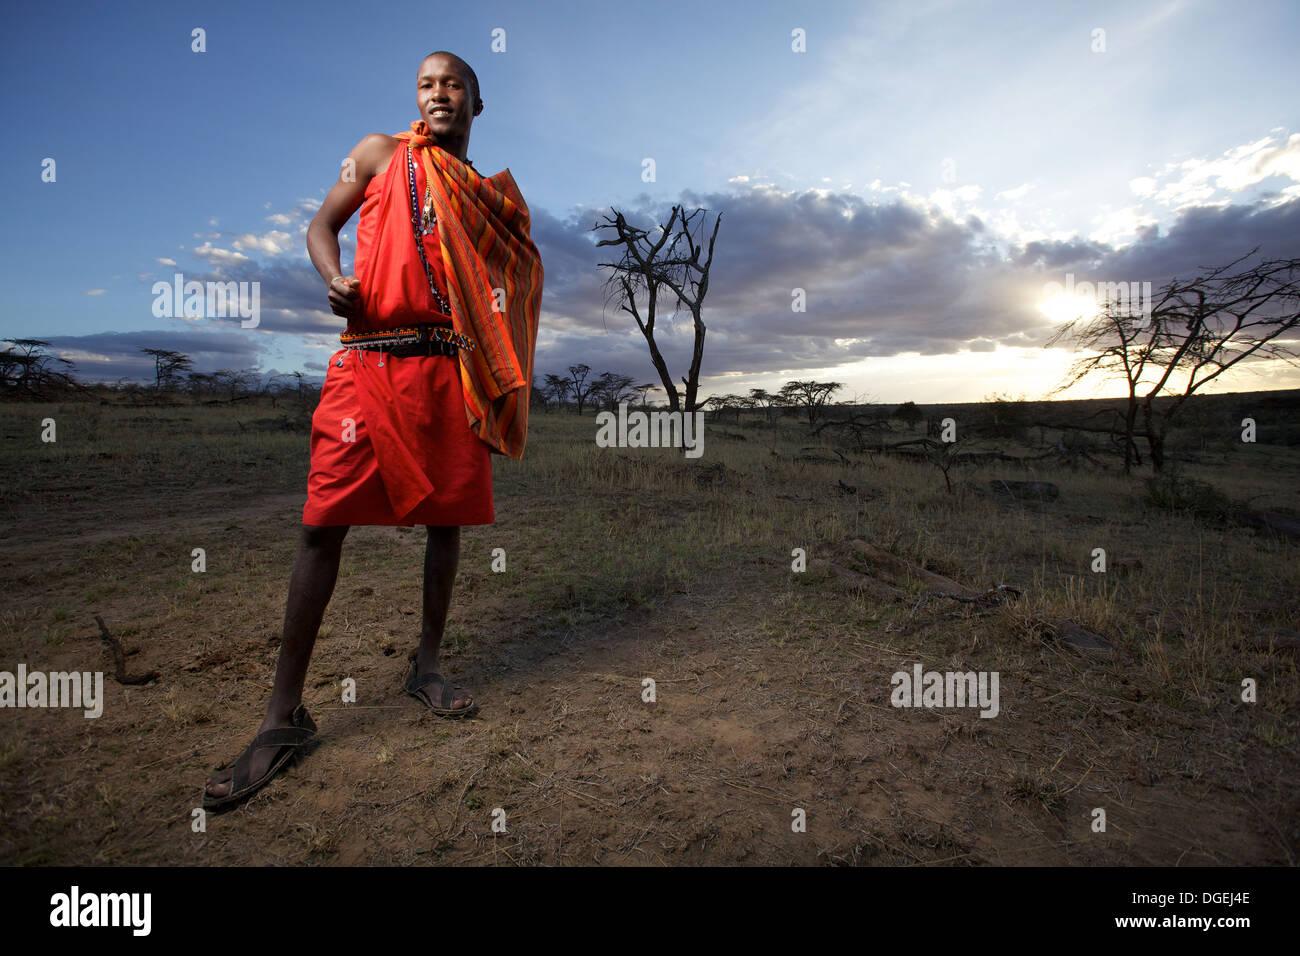 Maasai man portrait, Mara region, Kenya - Stock Image